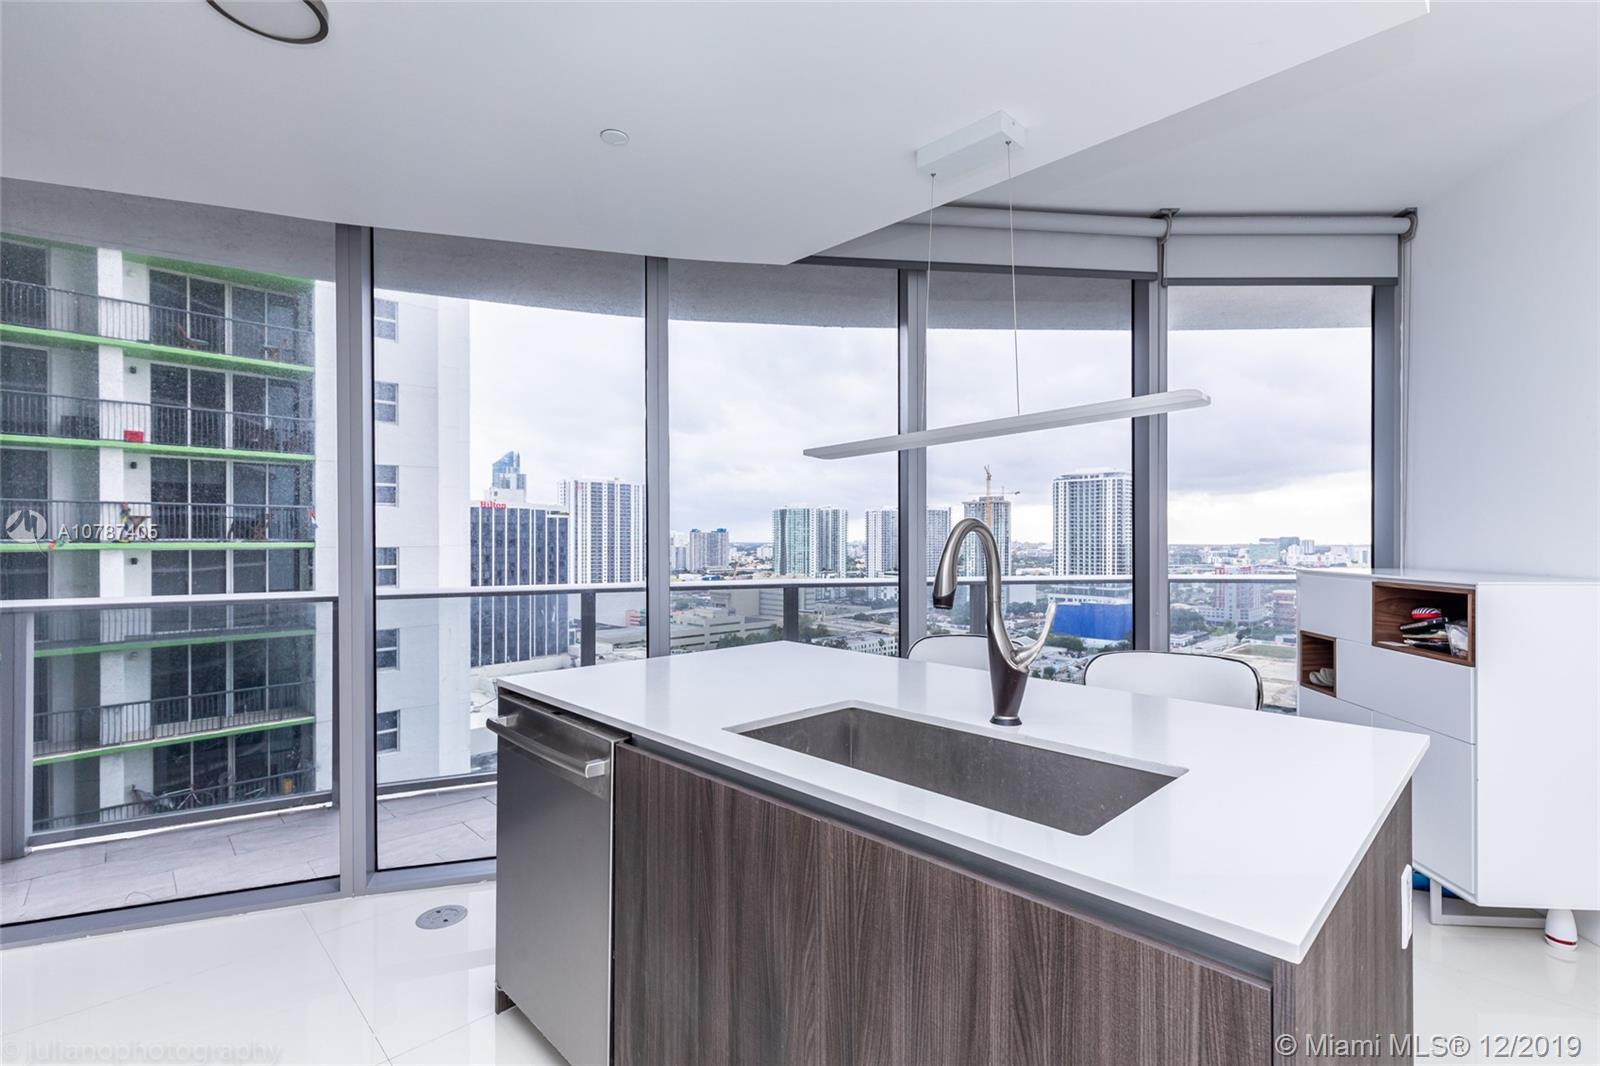 488 NE 18th St, Unit #2400 Luxury Real Estate